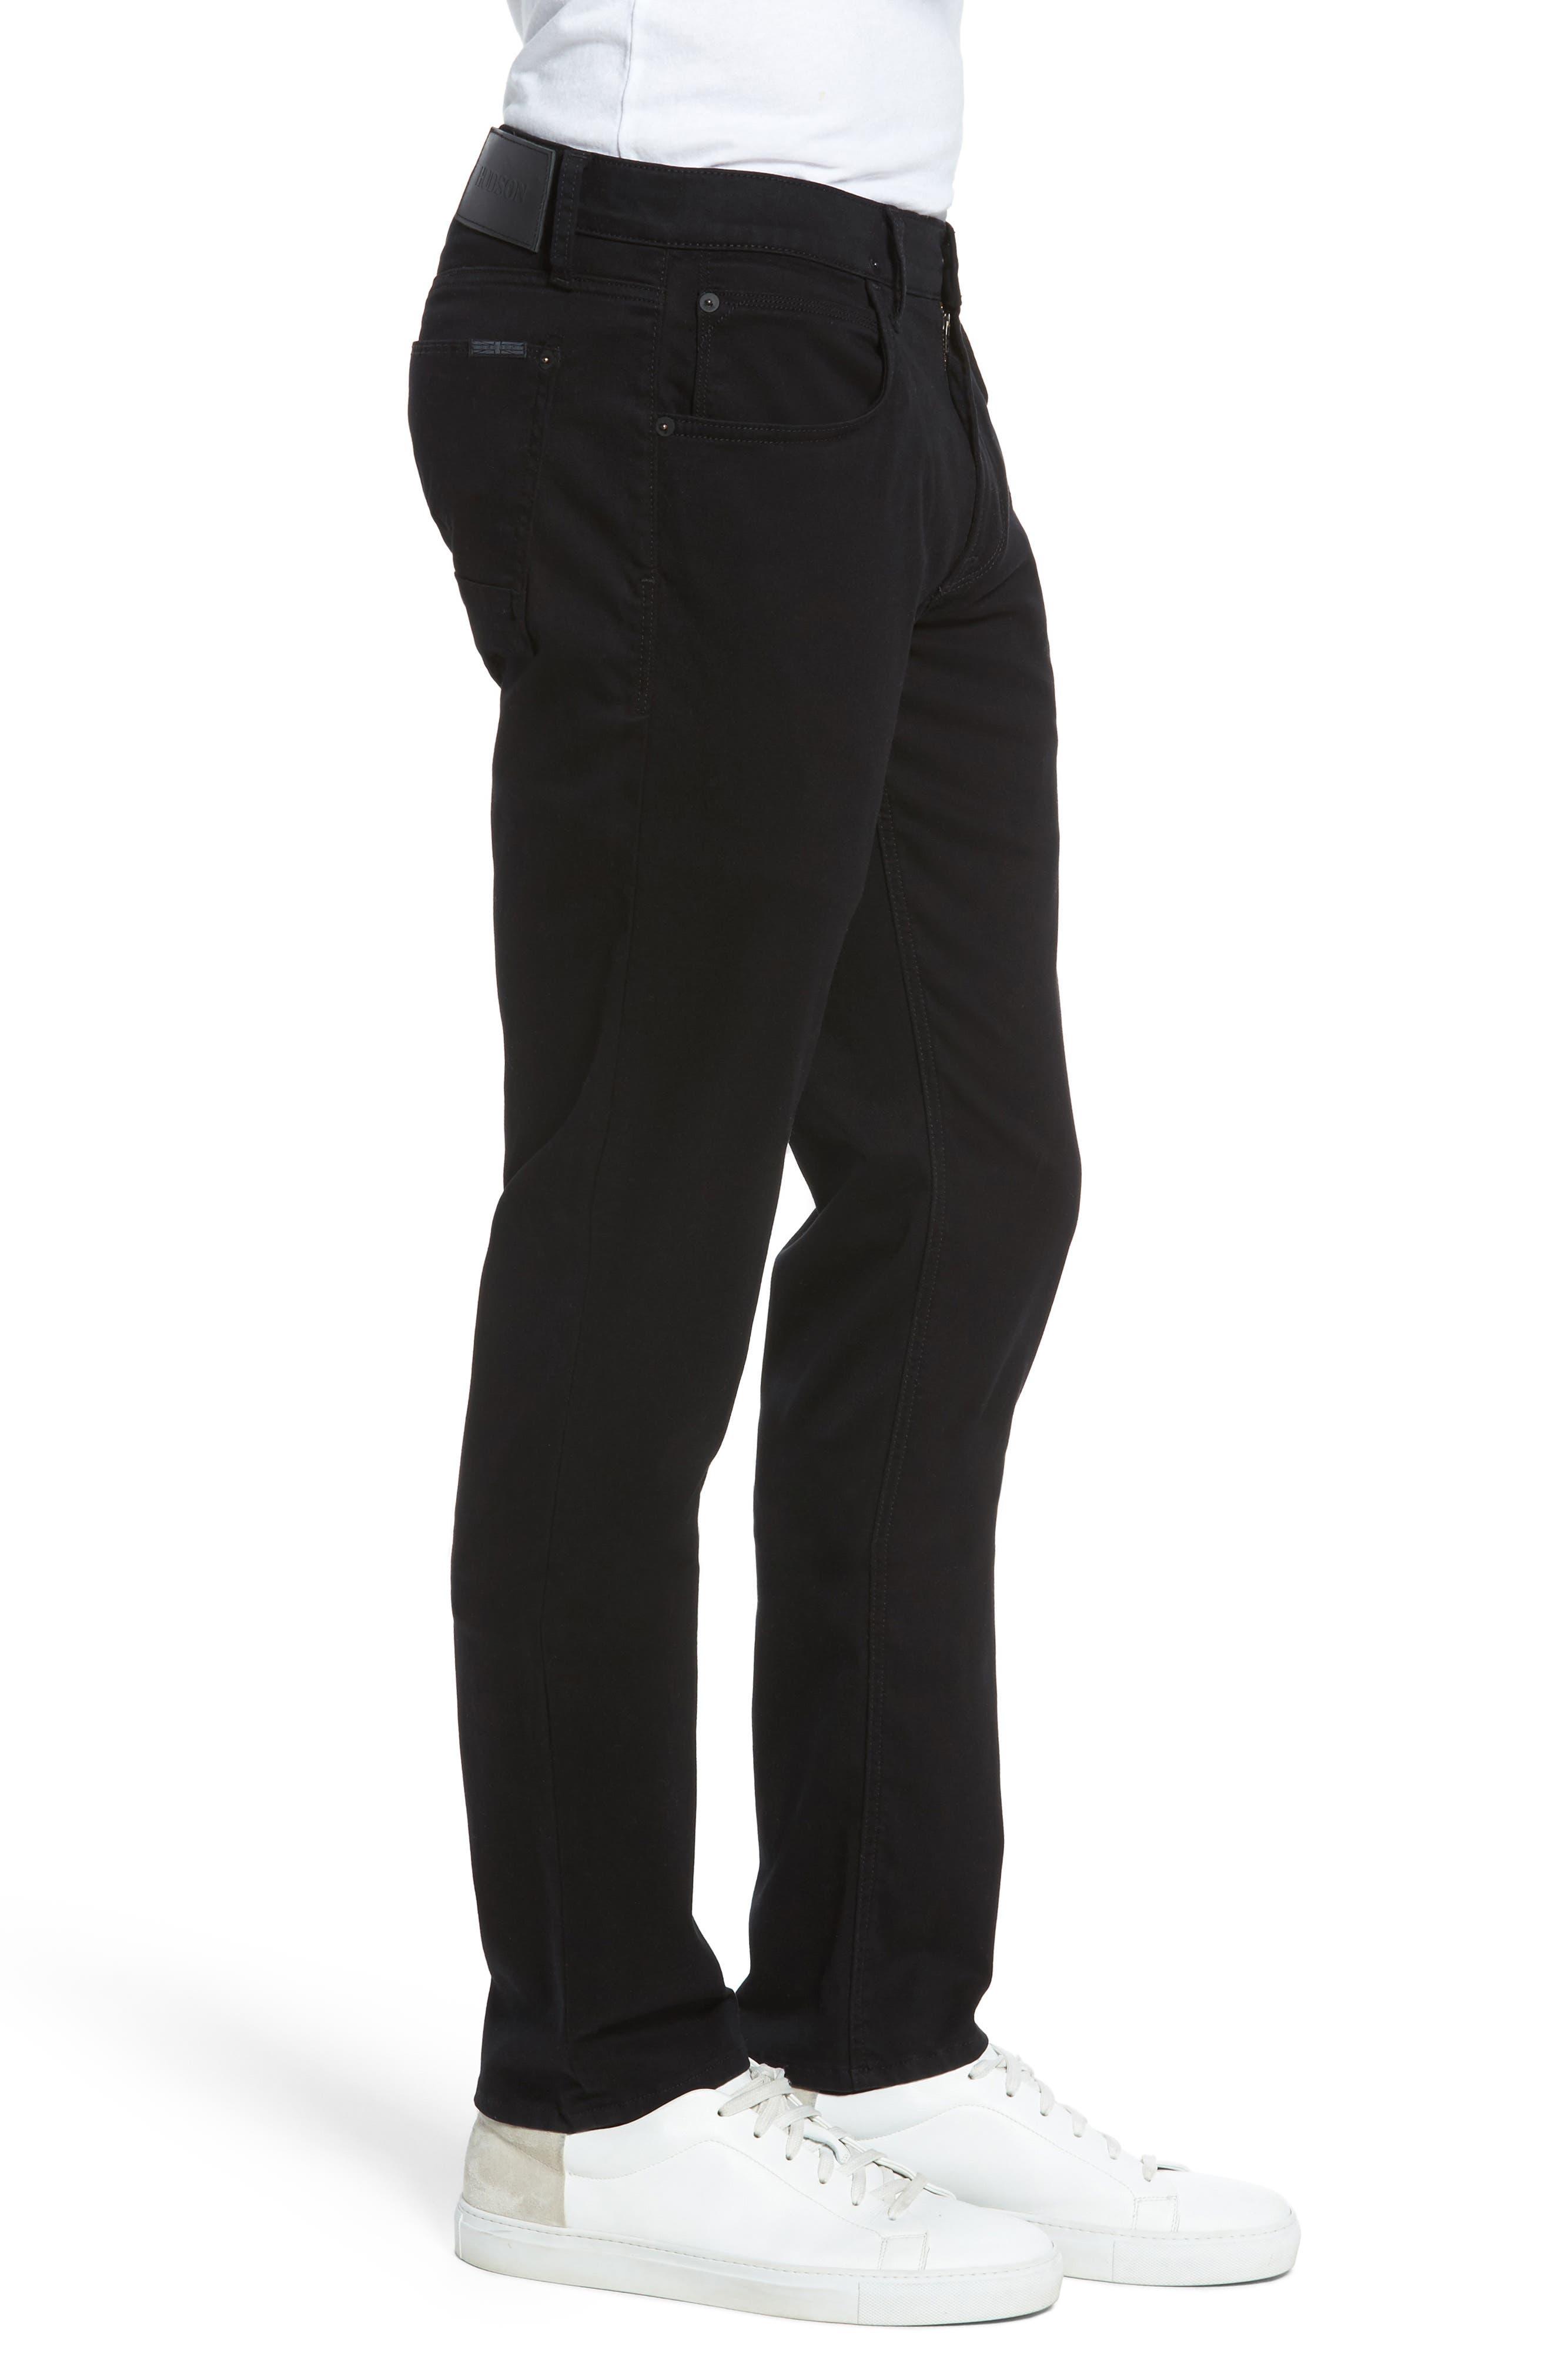 Blake Slim Fit Jeans,                             Alternate thumbnail 3, color,                             Blackened